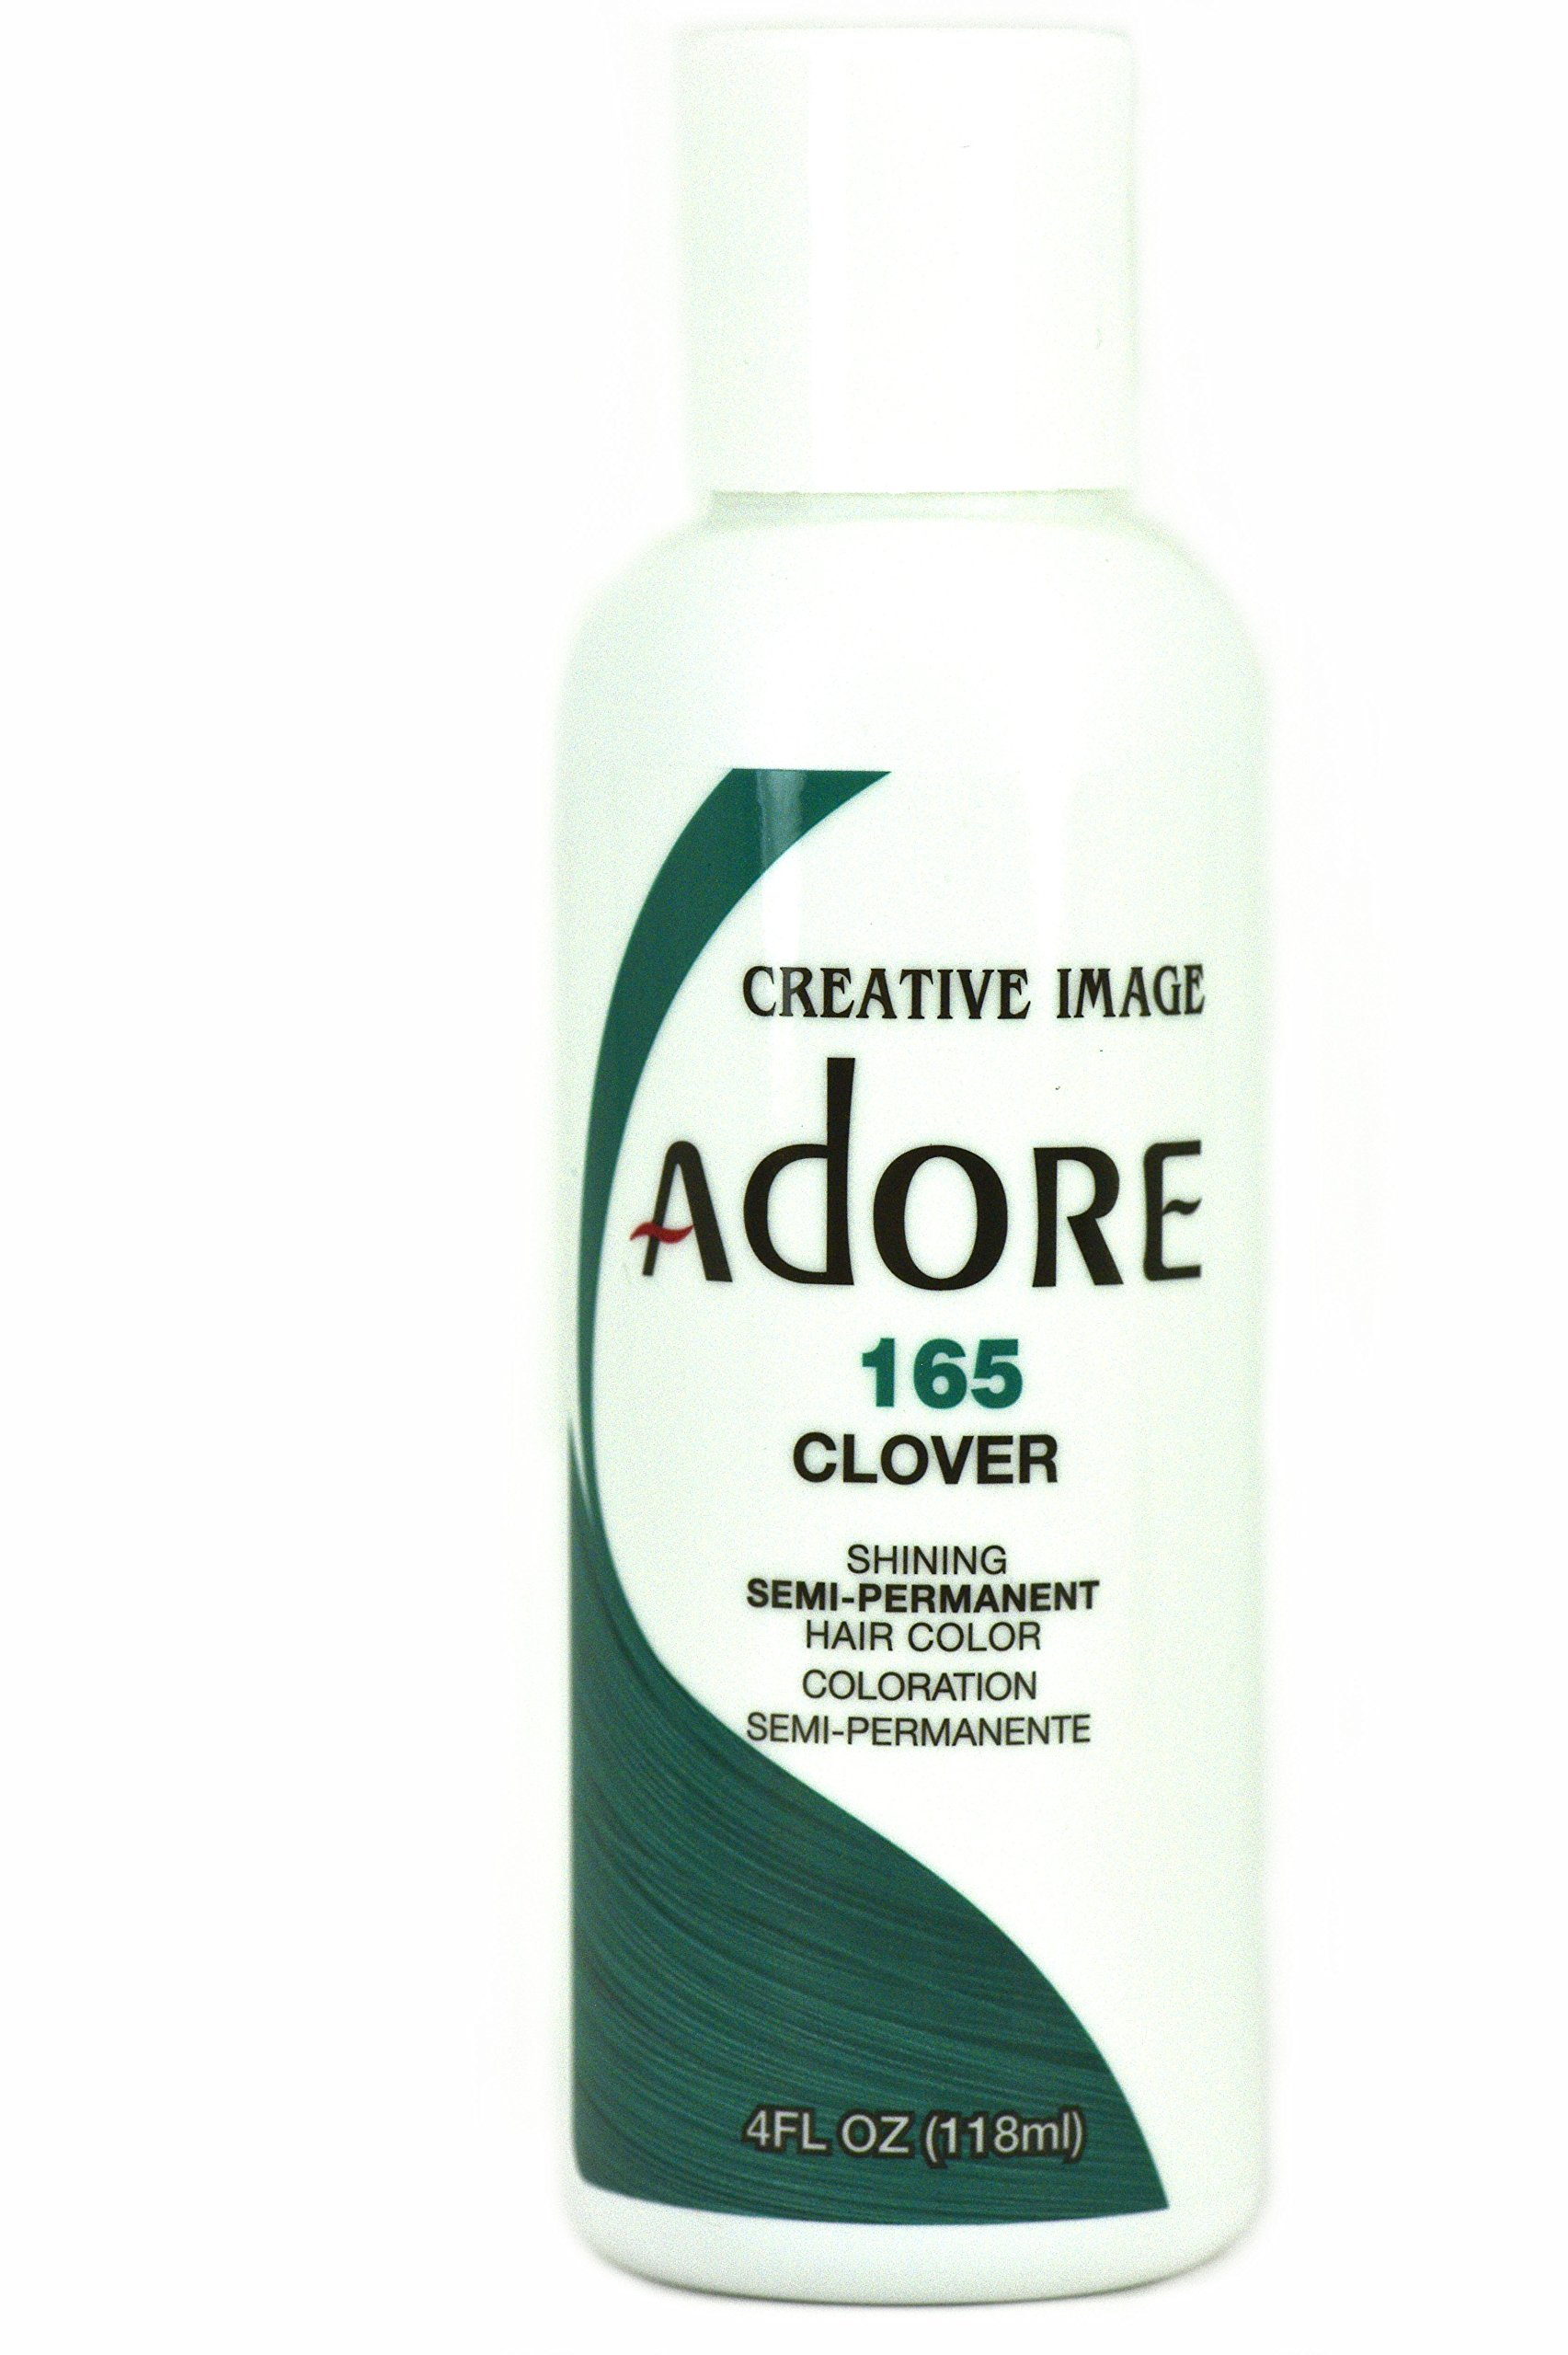 Amazoncom Adore Semi Permanent Hair Color 165 Clover Beauty